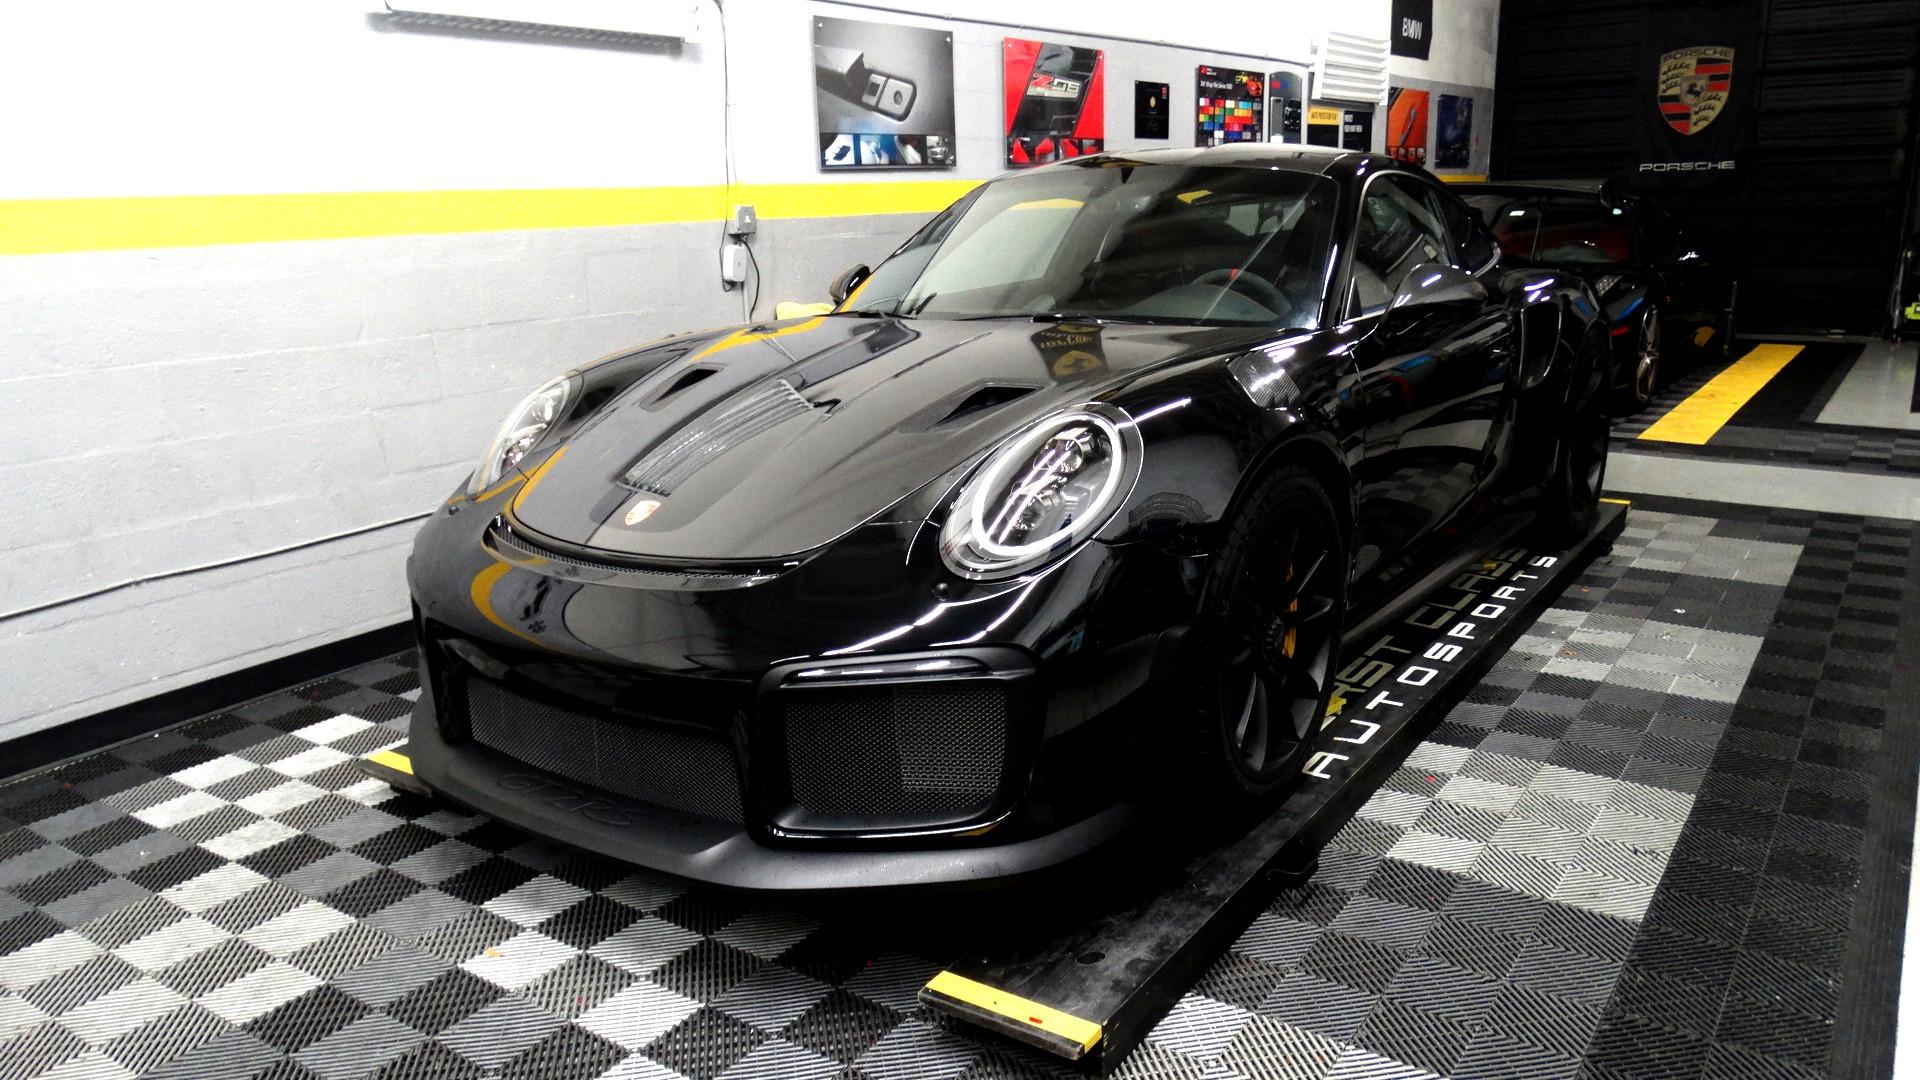 Porsche GT2 RS at #FCA_edited.jpg